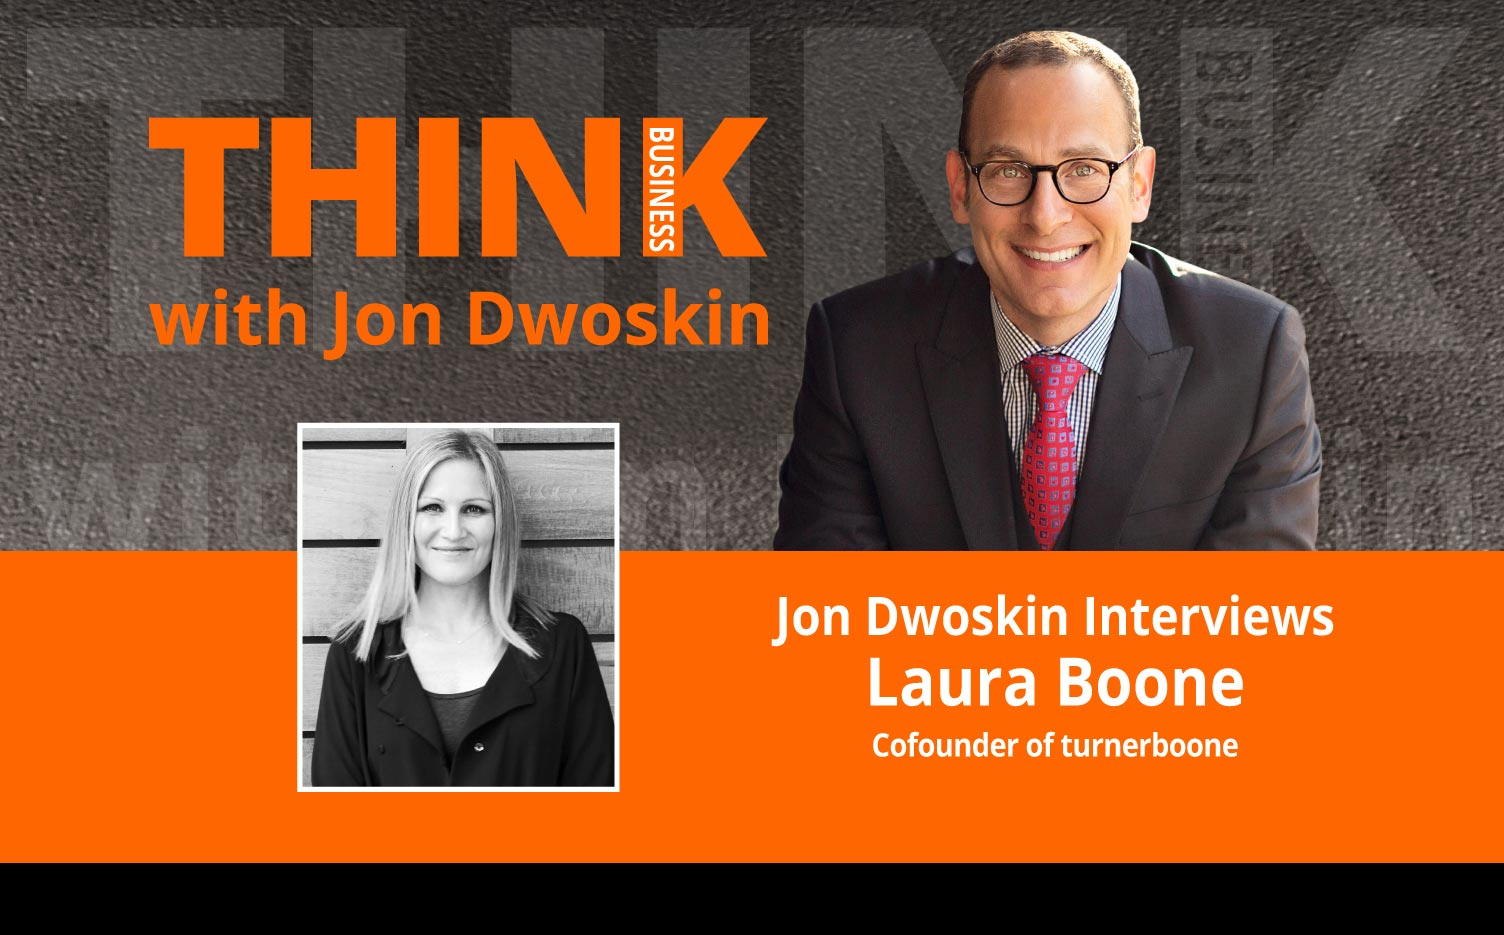 Jon Dwoskin Interviews Laura Boone, Cofounder of turnerboone